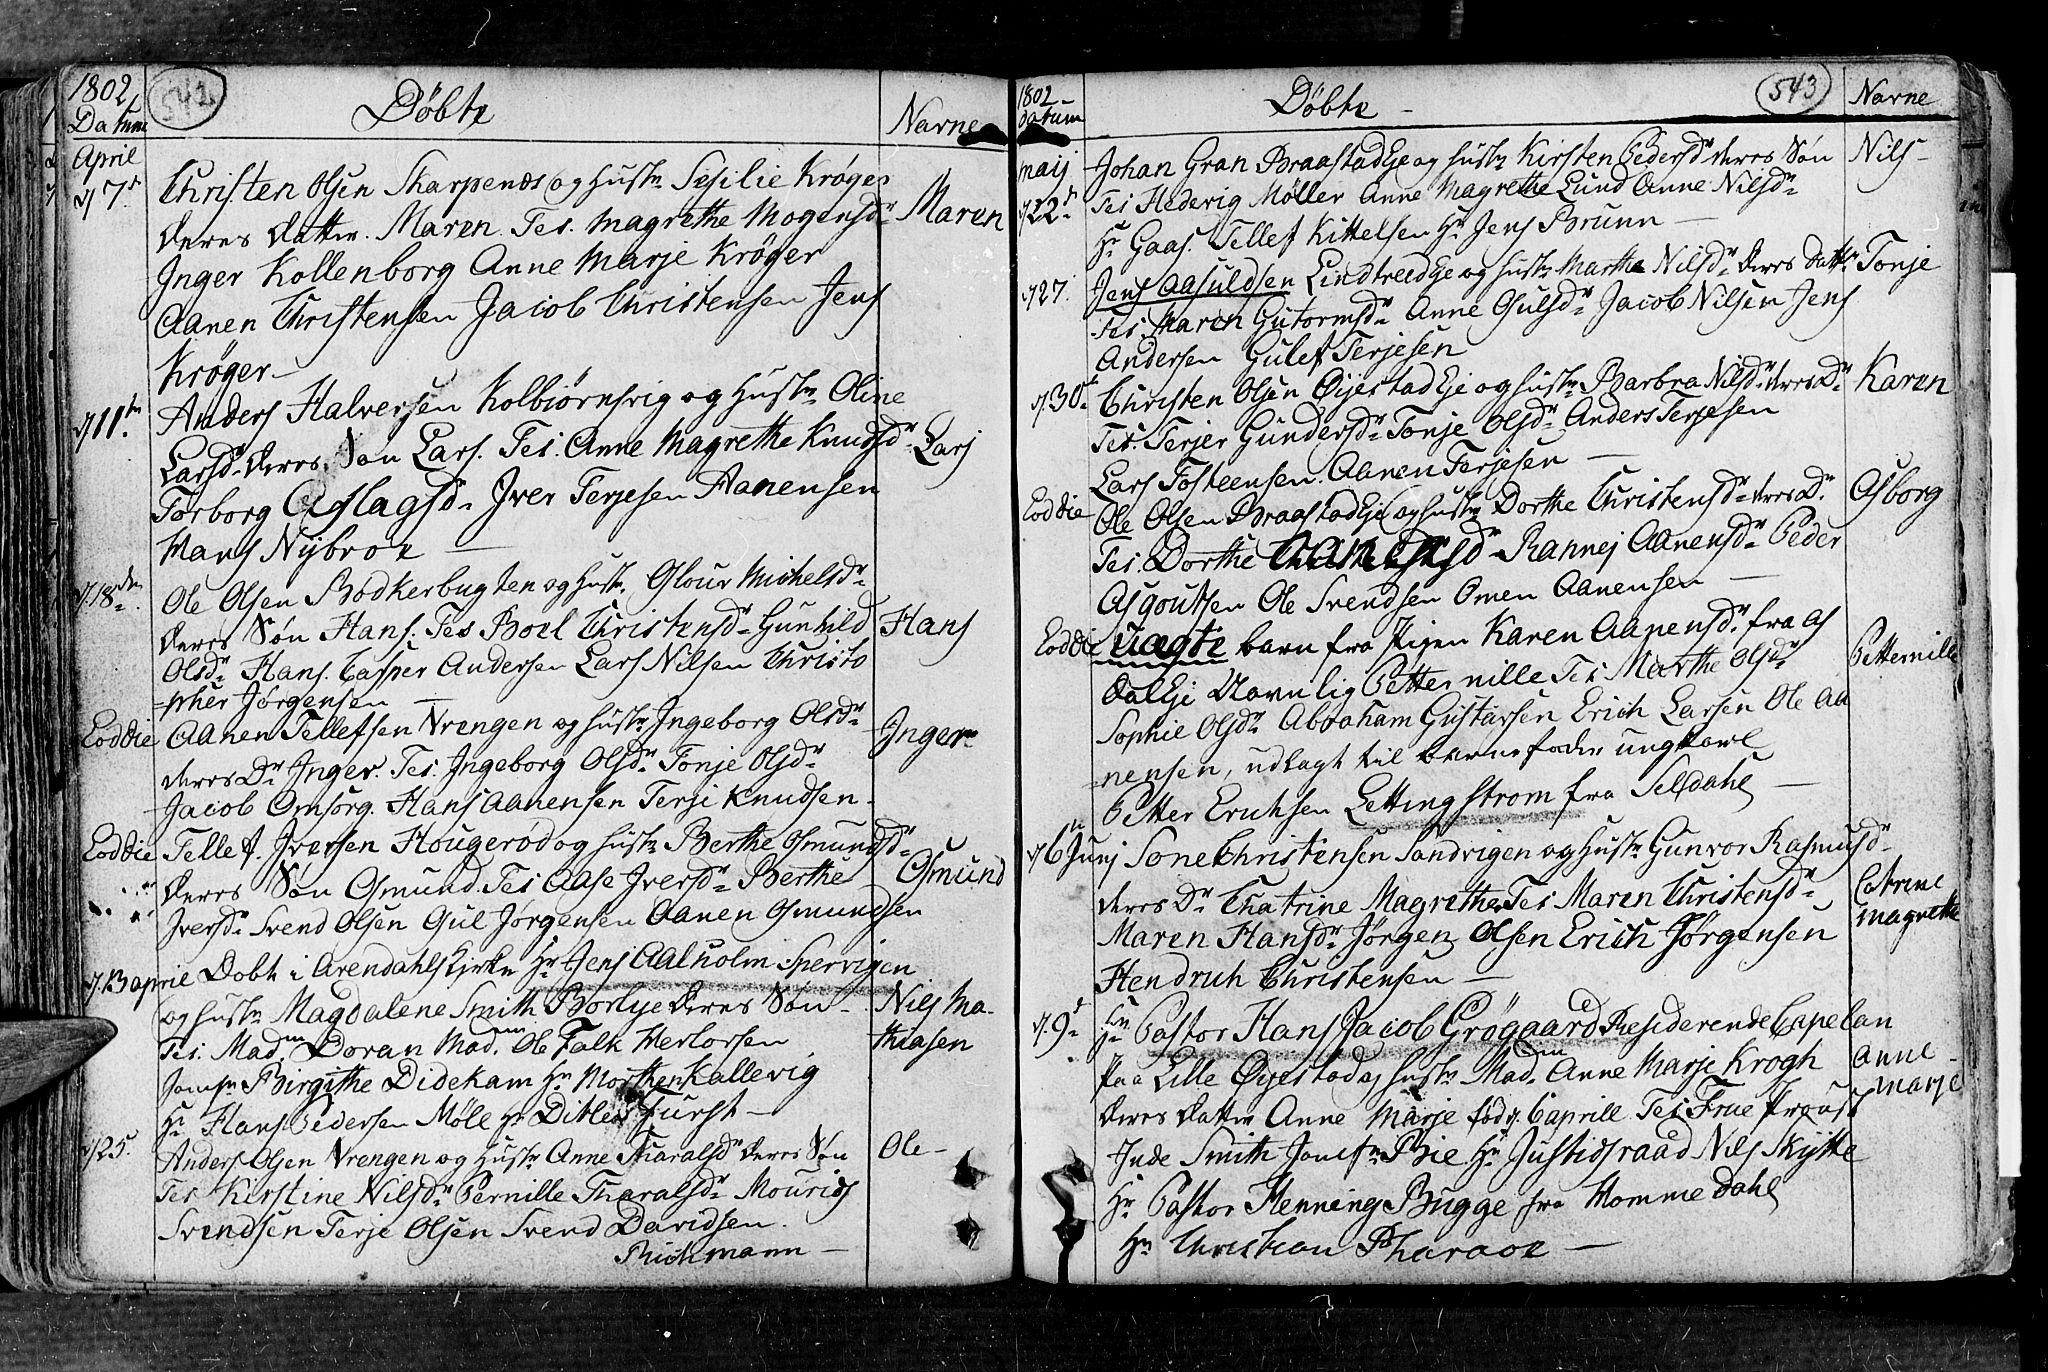 SAK, Øyestad sokneprestkontor, F/Fa/L0008: Ministerialbok nr. A 8, 1777-1804, s. 542-543